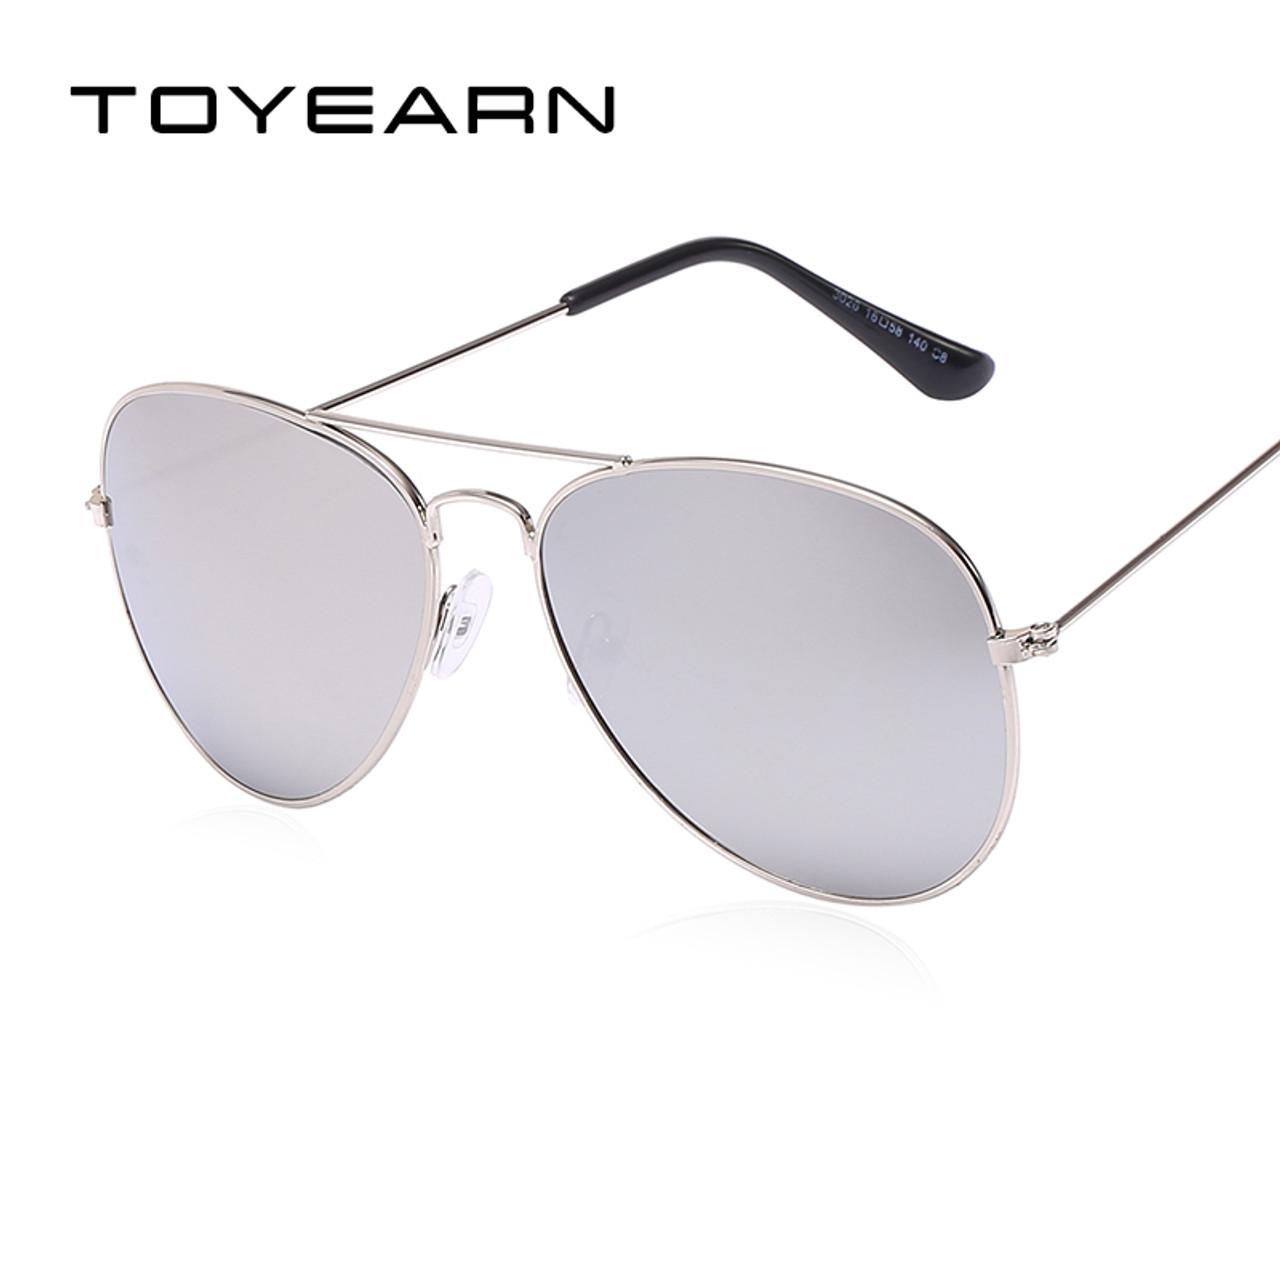 a9105a778b5e ... TOYEARN Vintage Classic Brand Designer Men s Pilot Sunglasses Women Men  Driving UV400 Mirror Sun Glasses Female ...